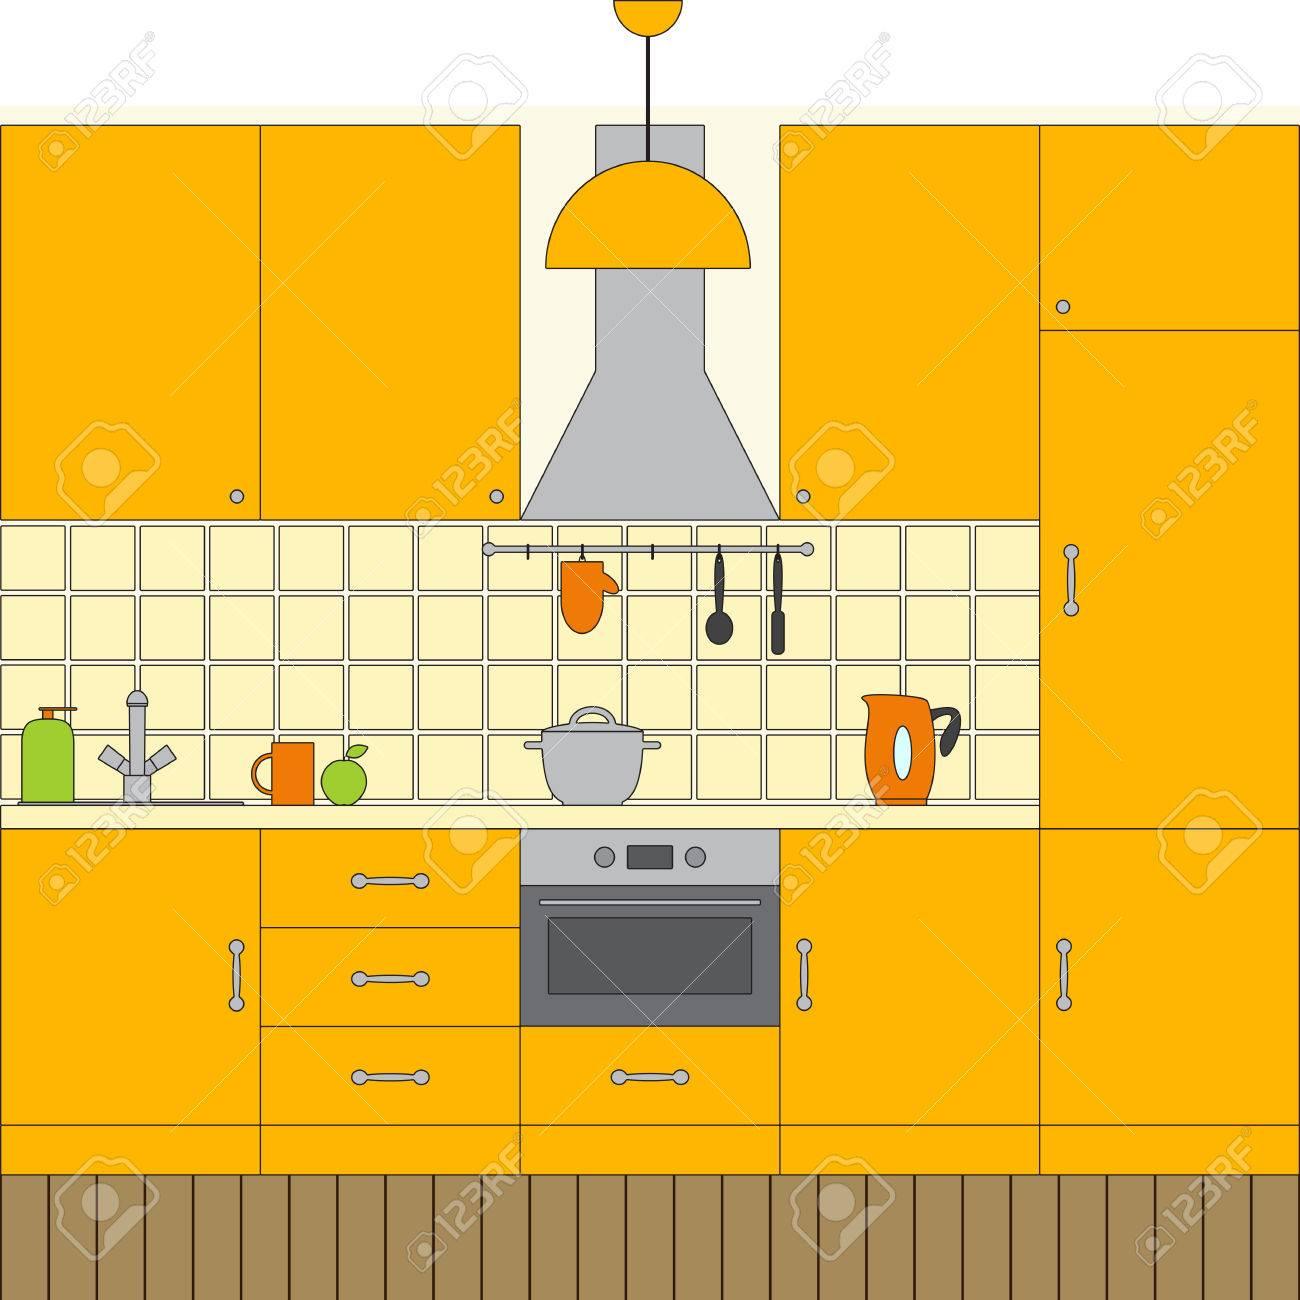 Awesome Cappe Aspirazione Cucina Da Incasso Pictures ...